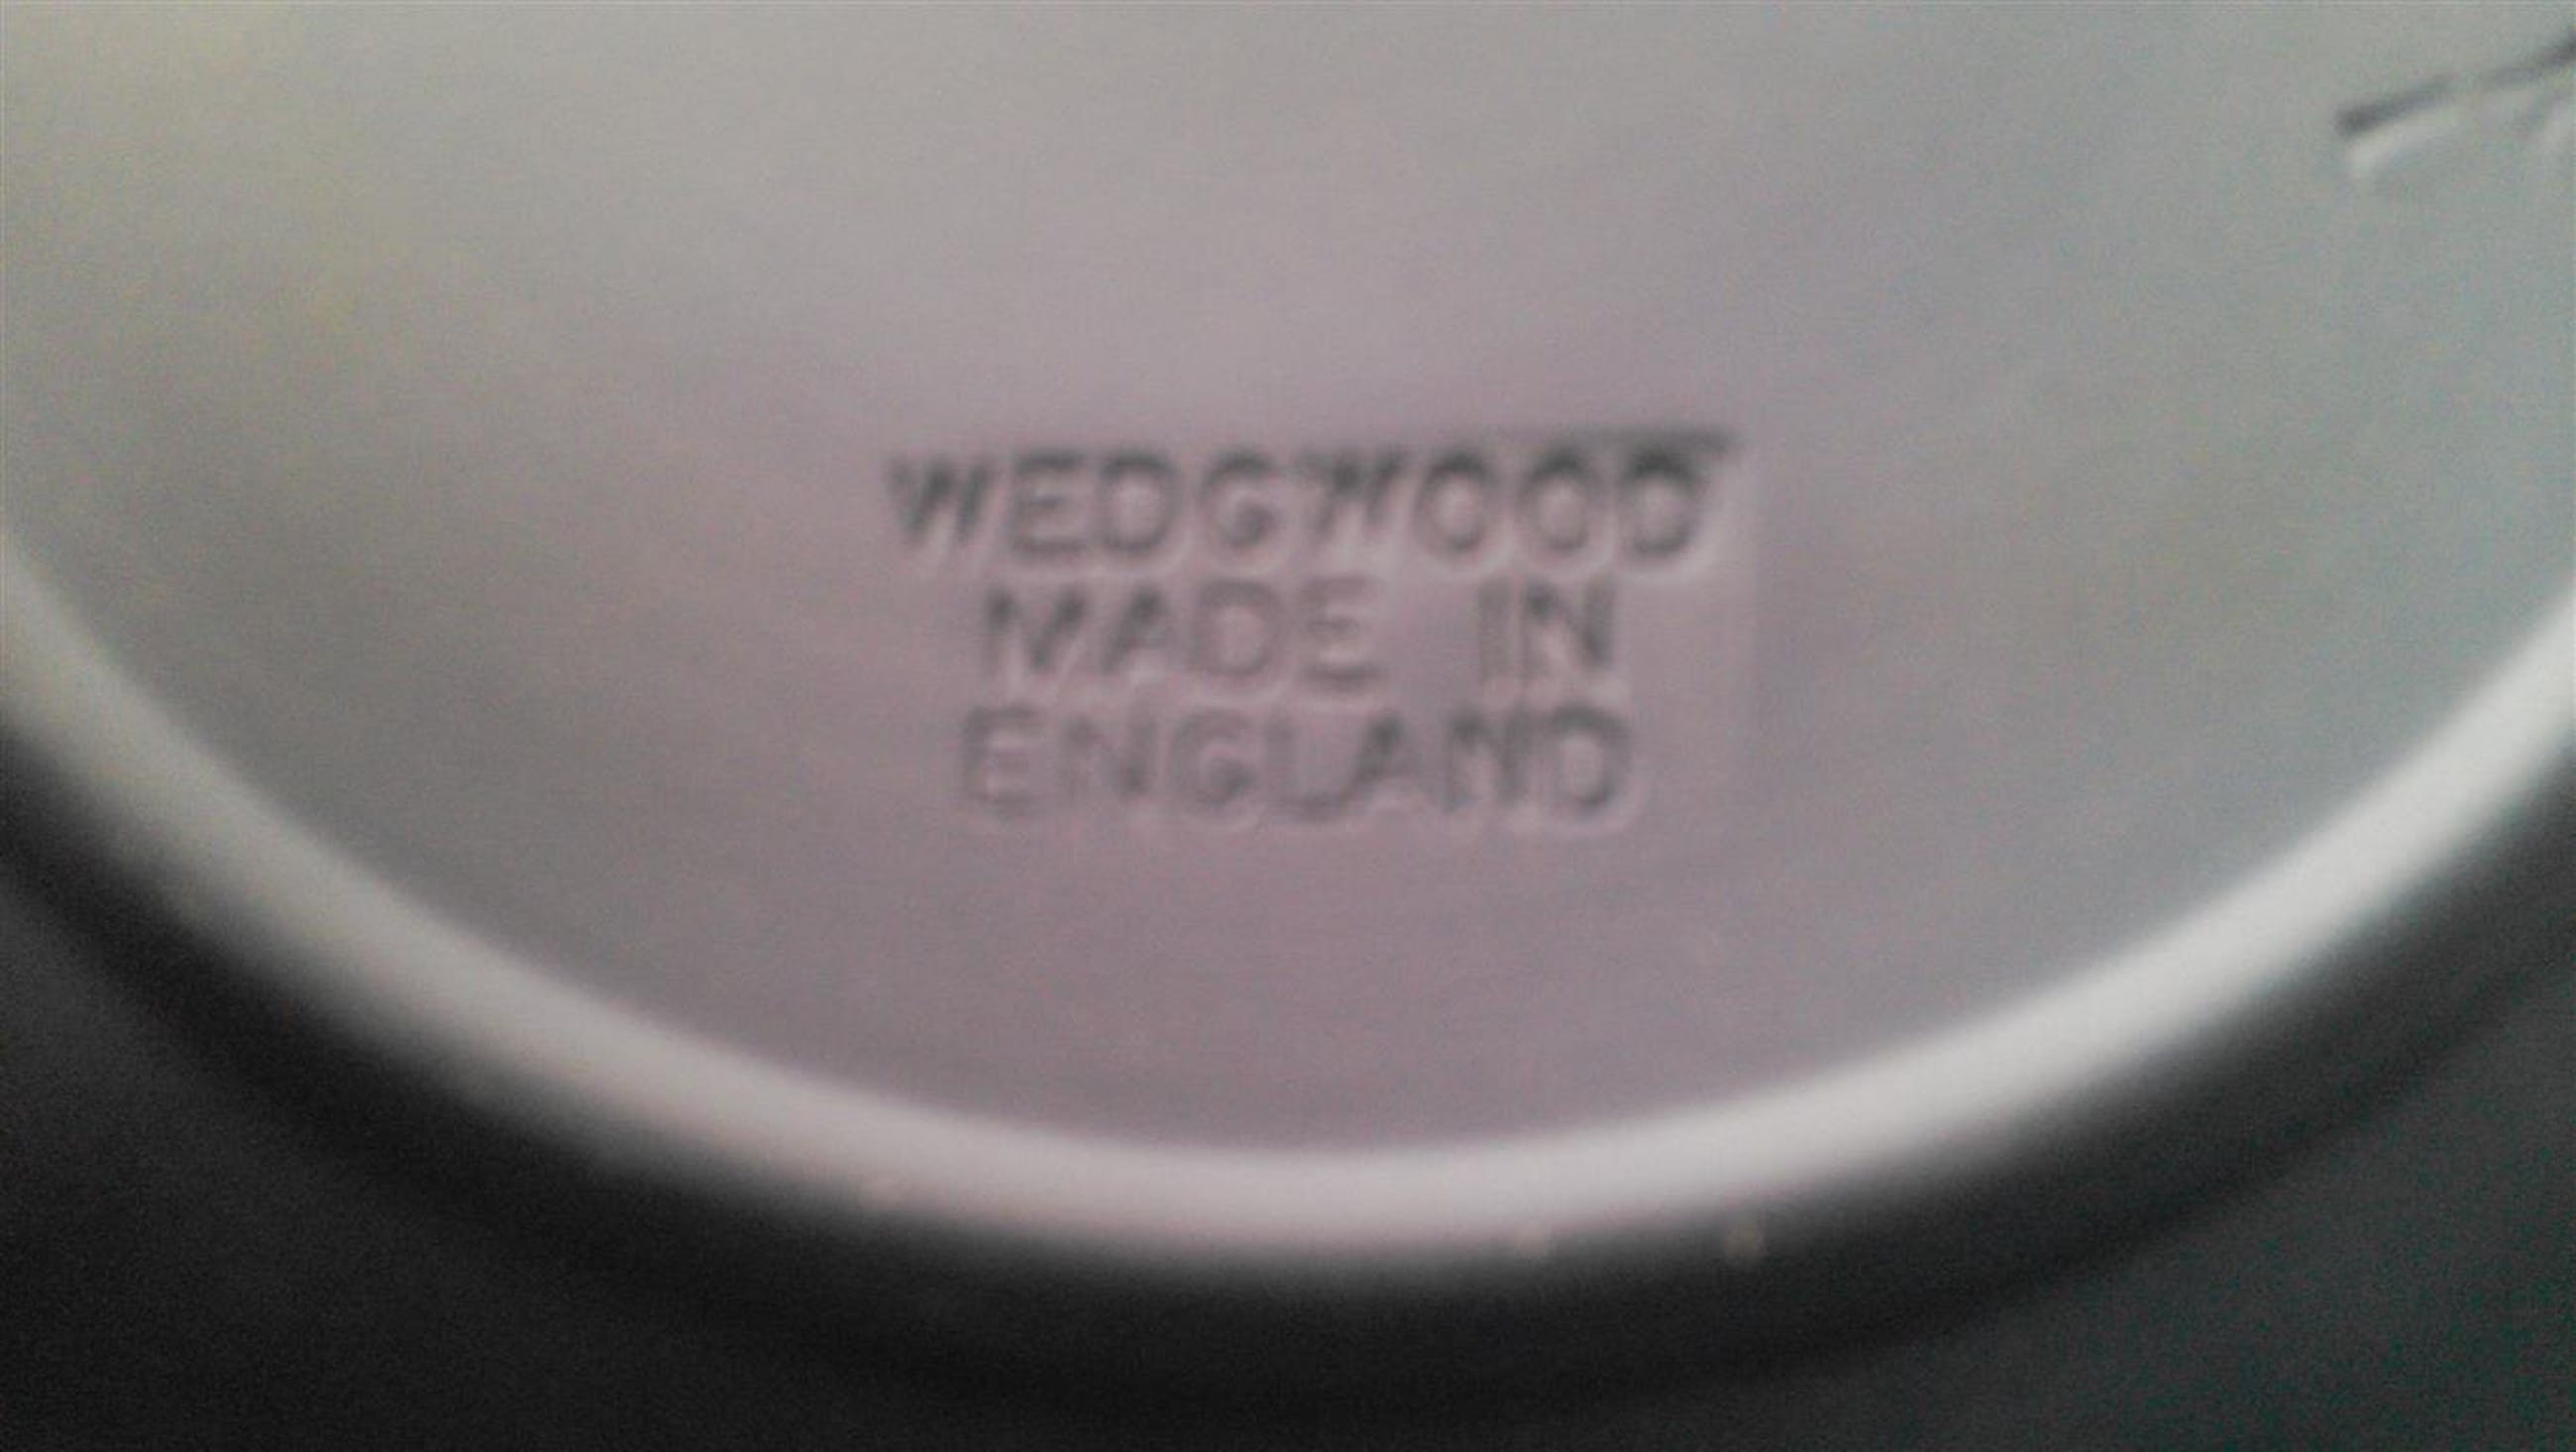 Wedgwood - Camee bordje kopen? Bied vanaf 19!